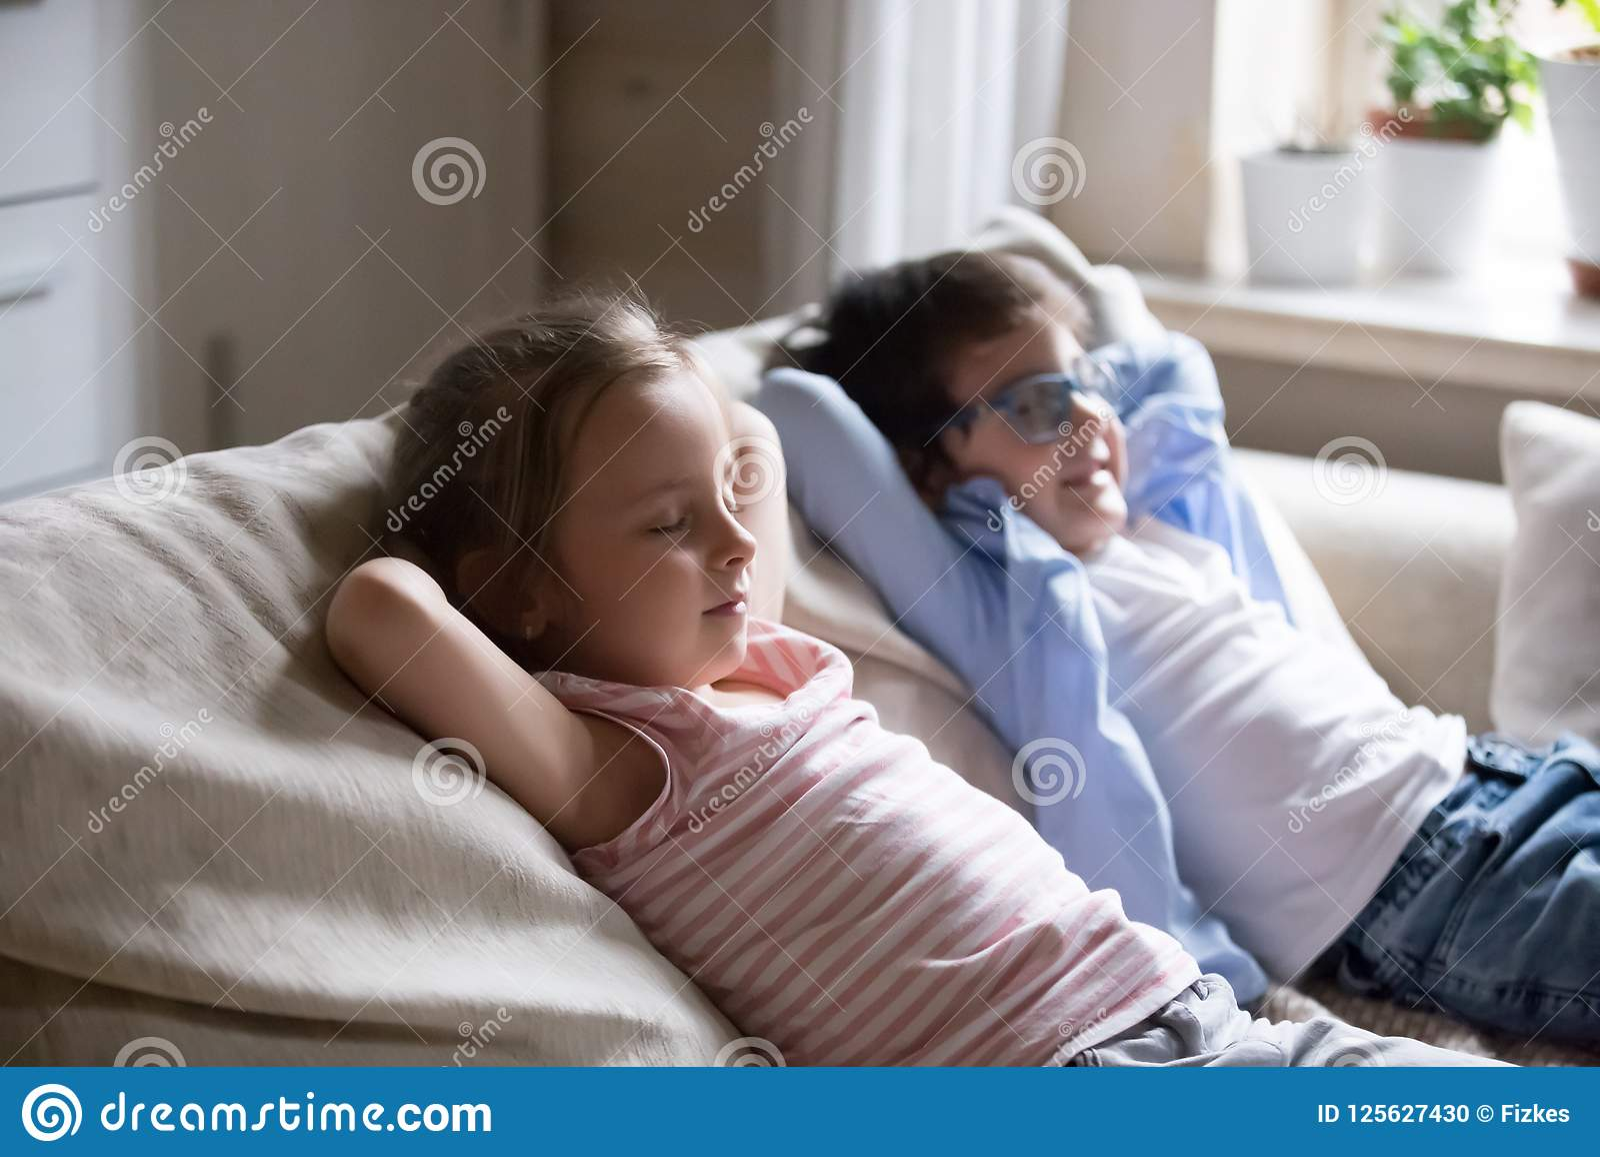 Cute boy and girl lying on cozy sofa relaxing